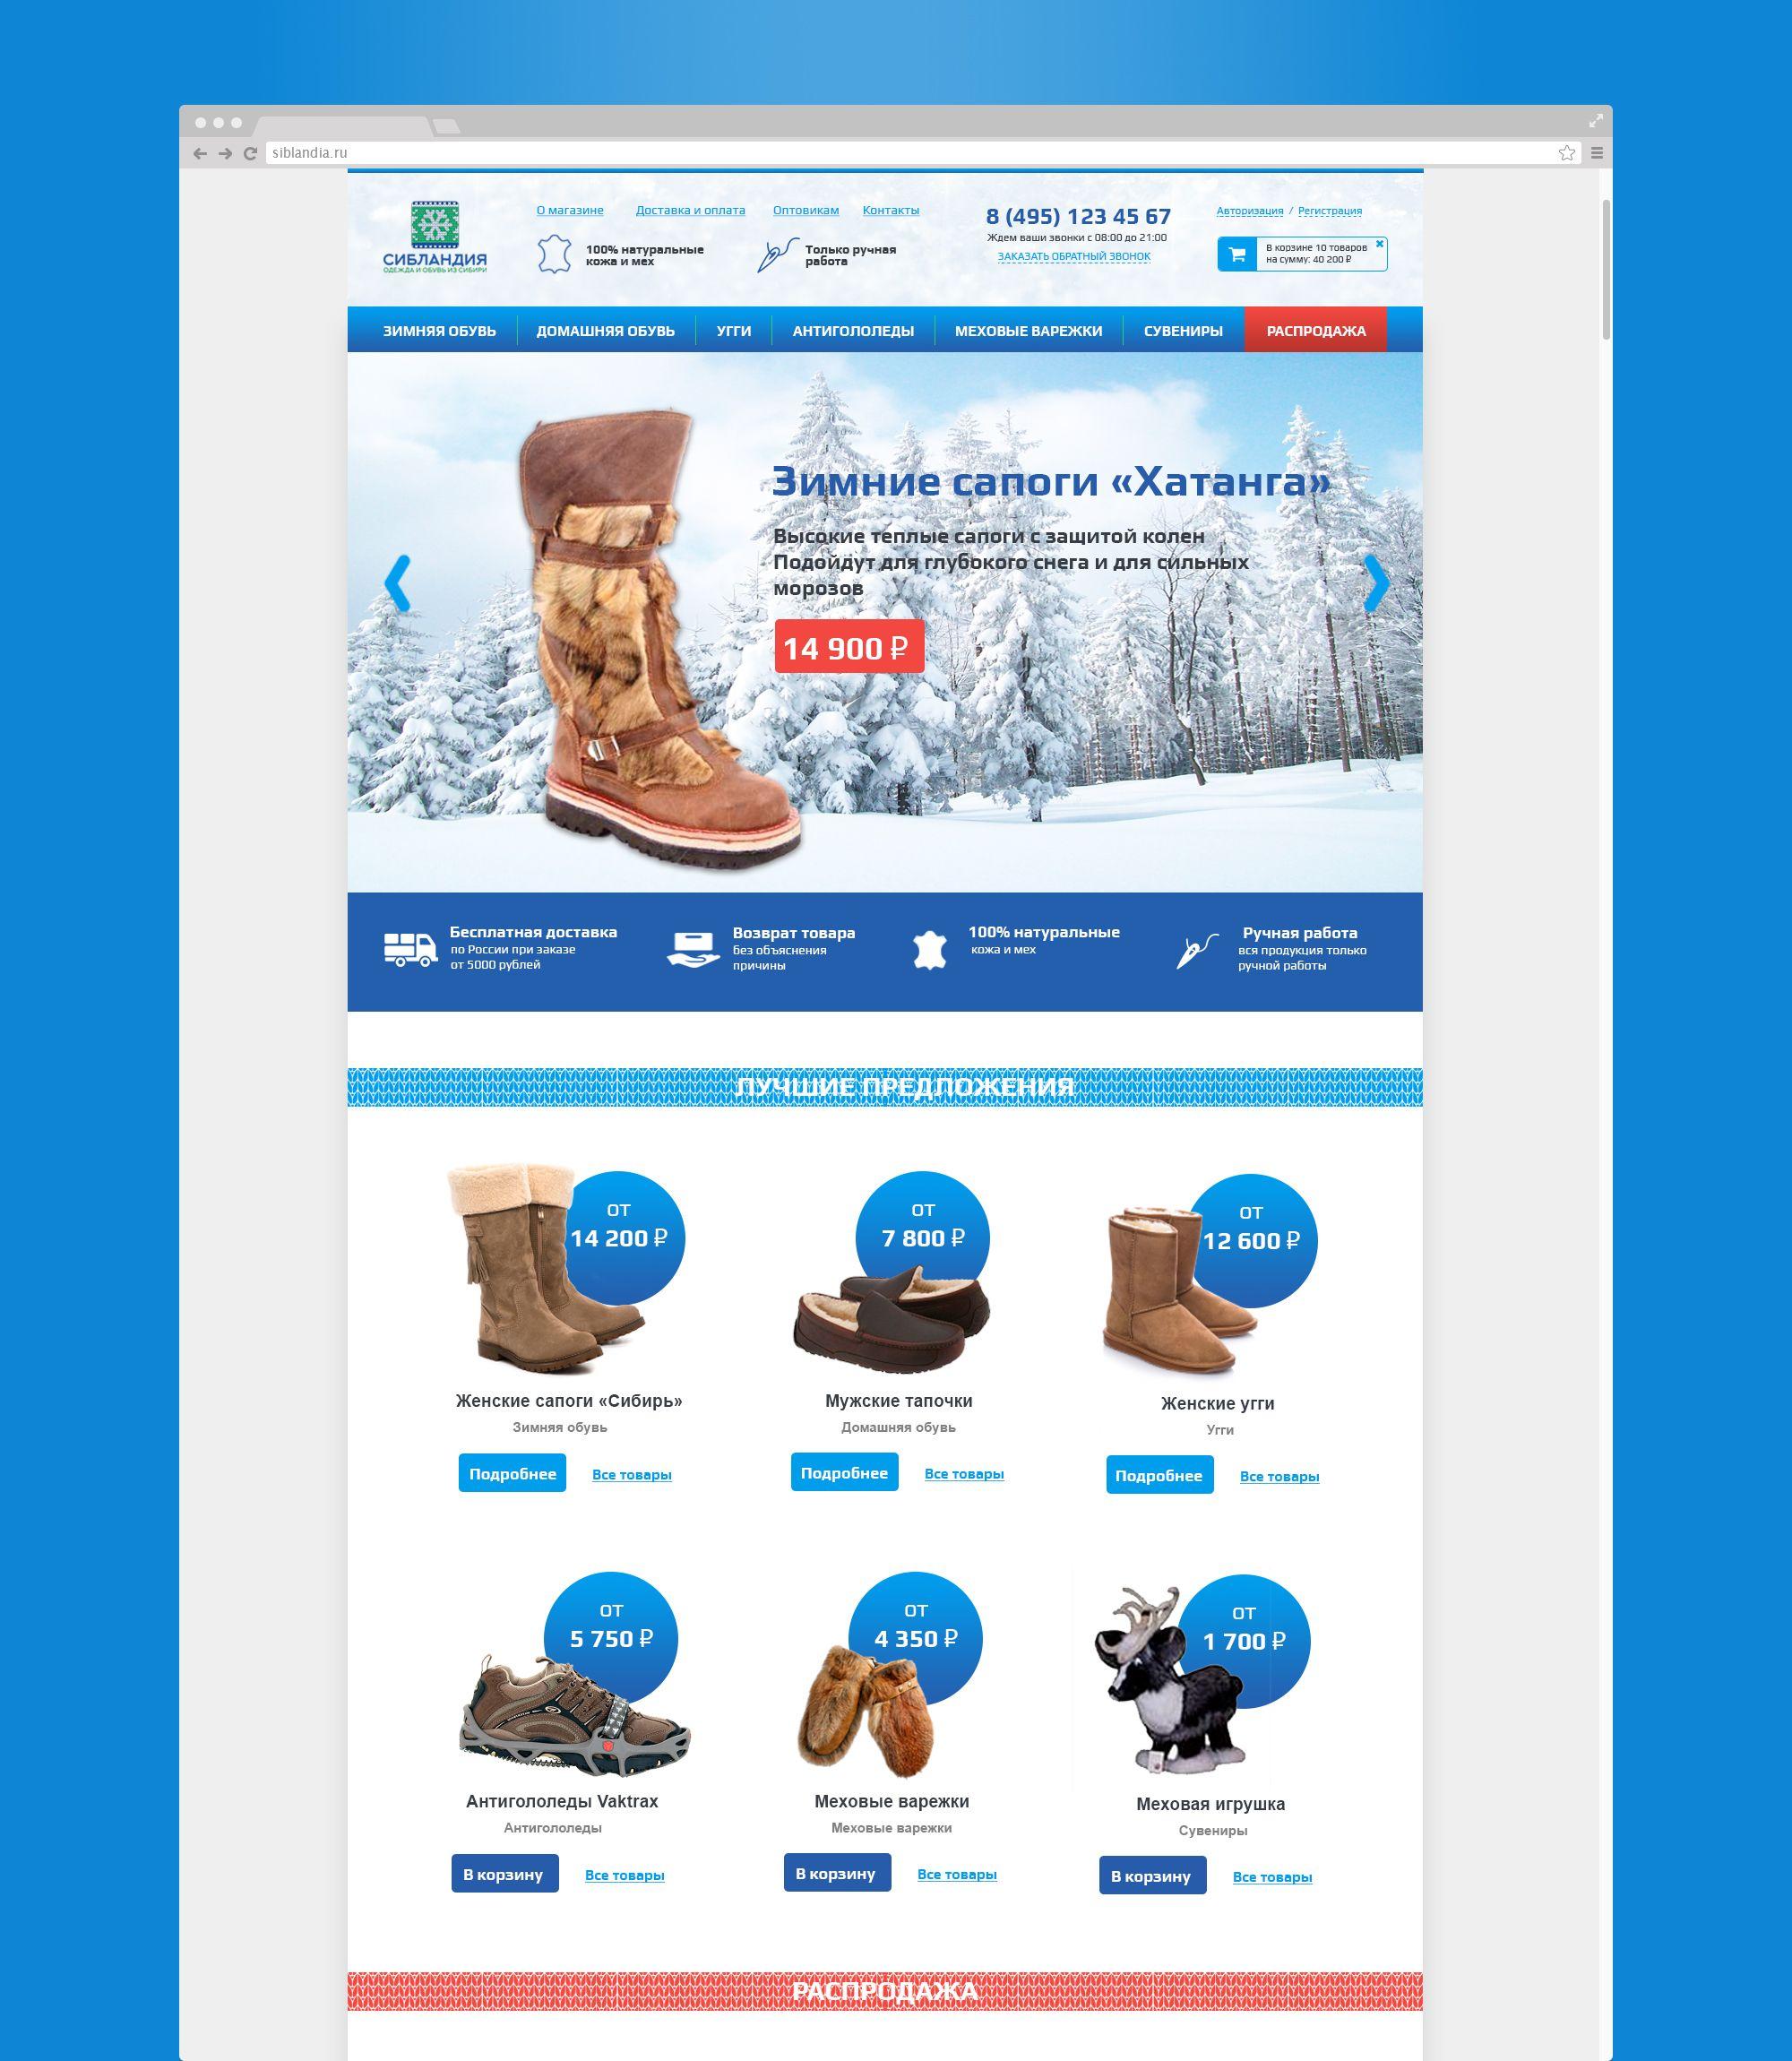 Дизайн сайта Сибландия — siblandia.ru - дизайнер yuppy